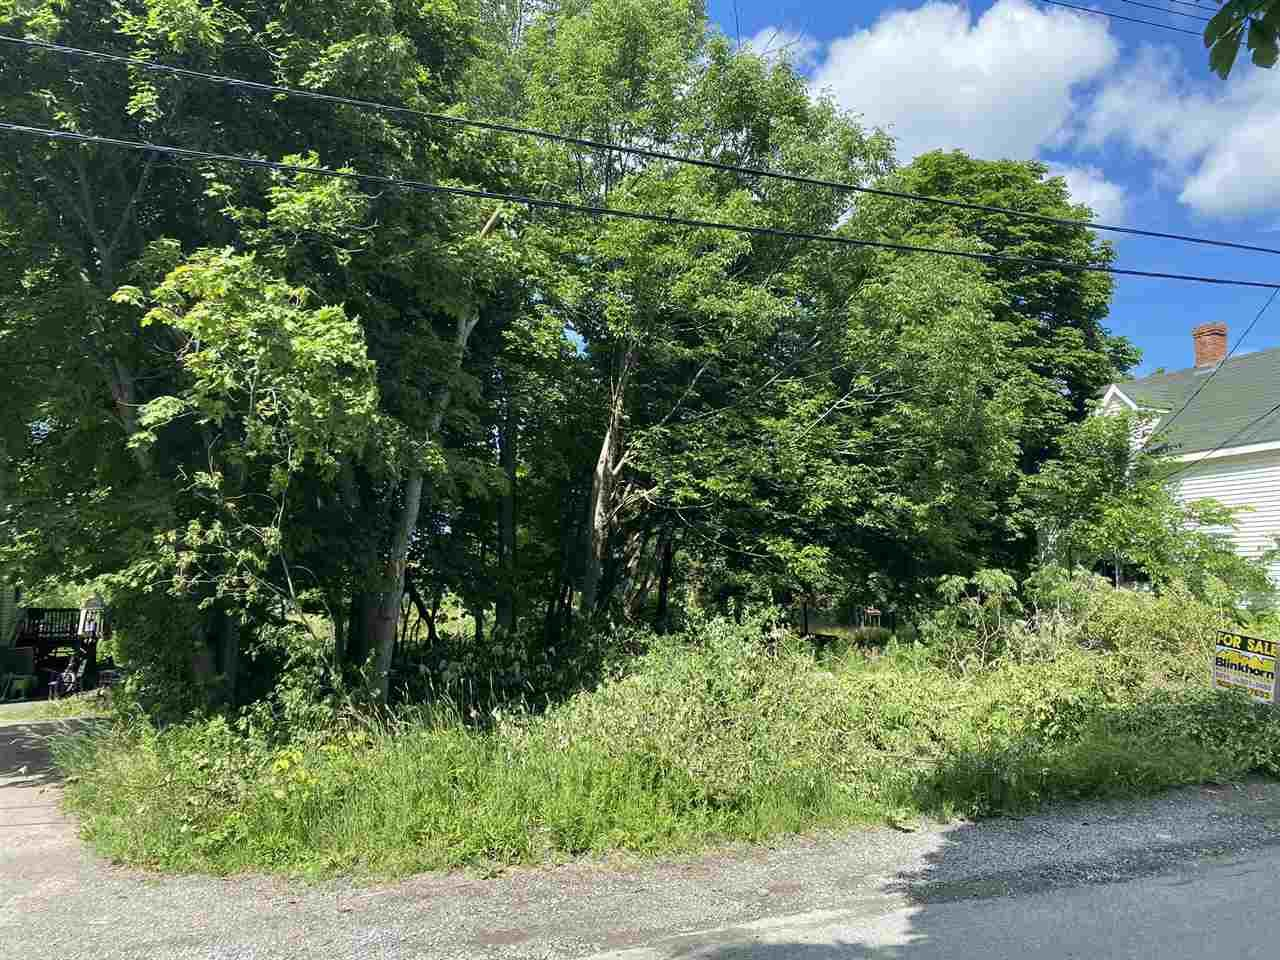 Main Photo: Lot North Street in Westville: 107-Trenton,Westville,Pictou Vacant Land for sale (Northern Region)  : MLS®# 202012391